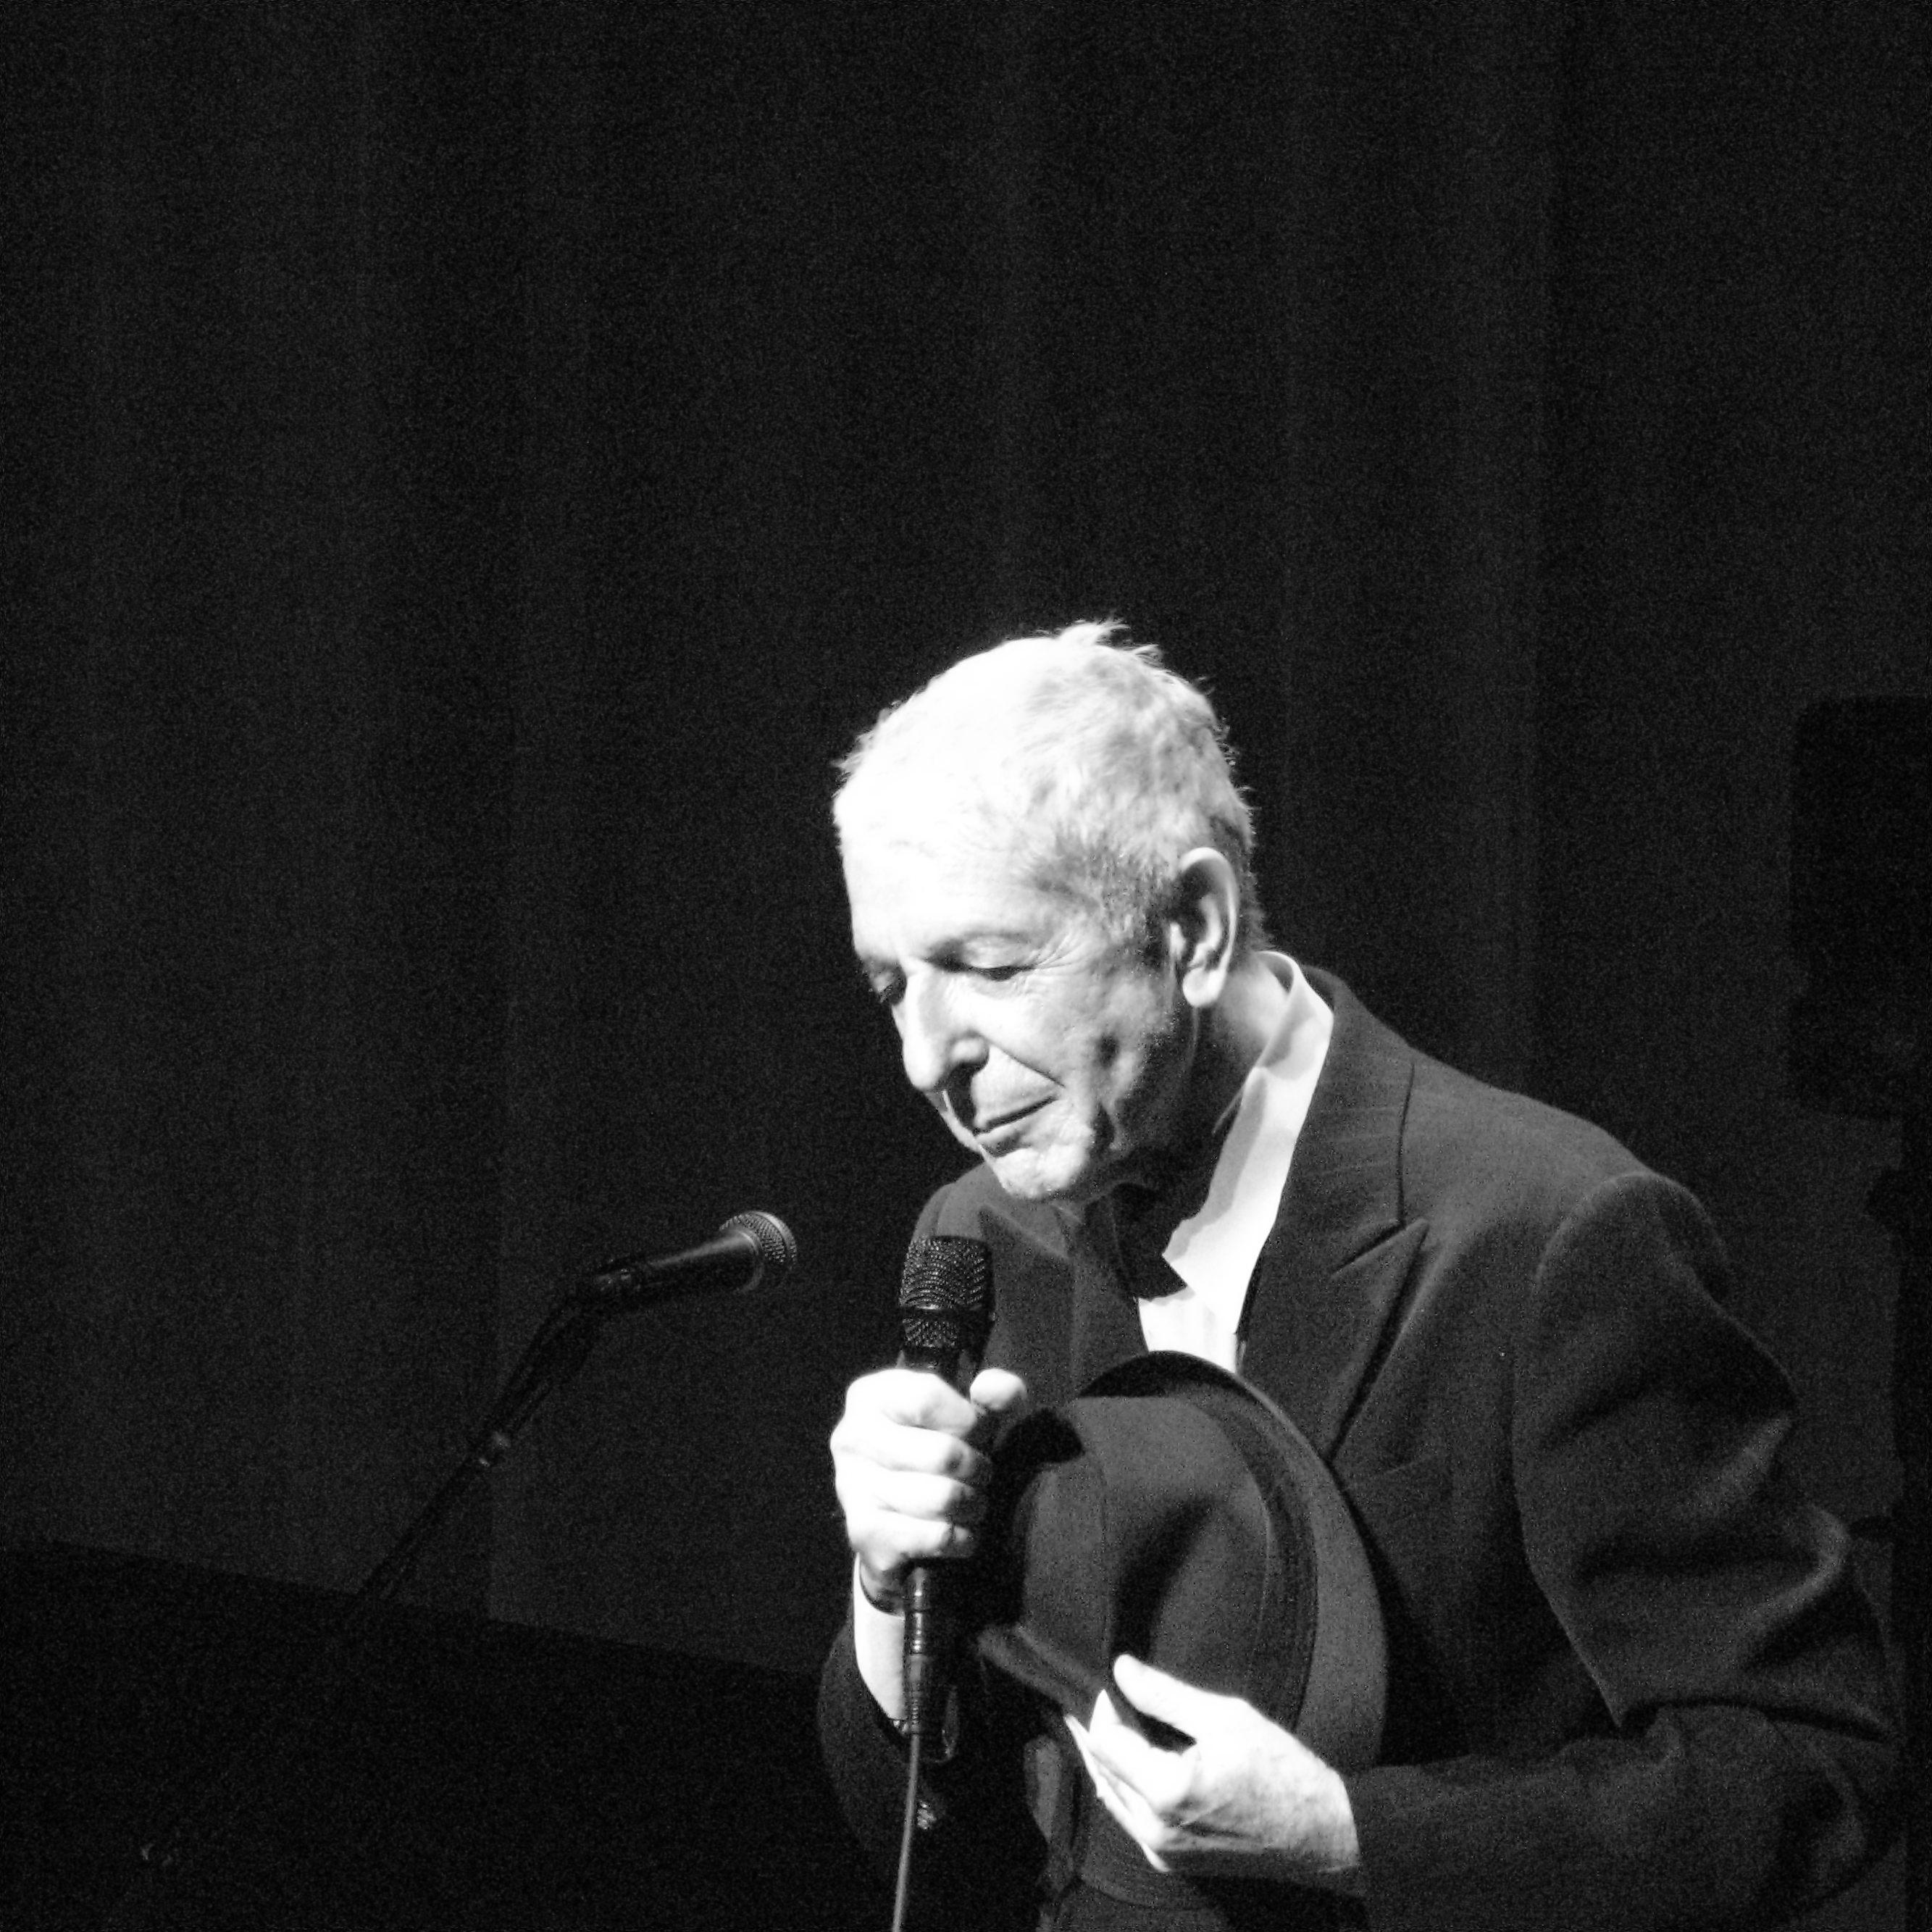 File:Leonard Cohen 2120.jpg - Wikimedia Commons